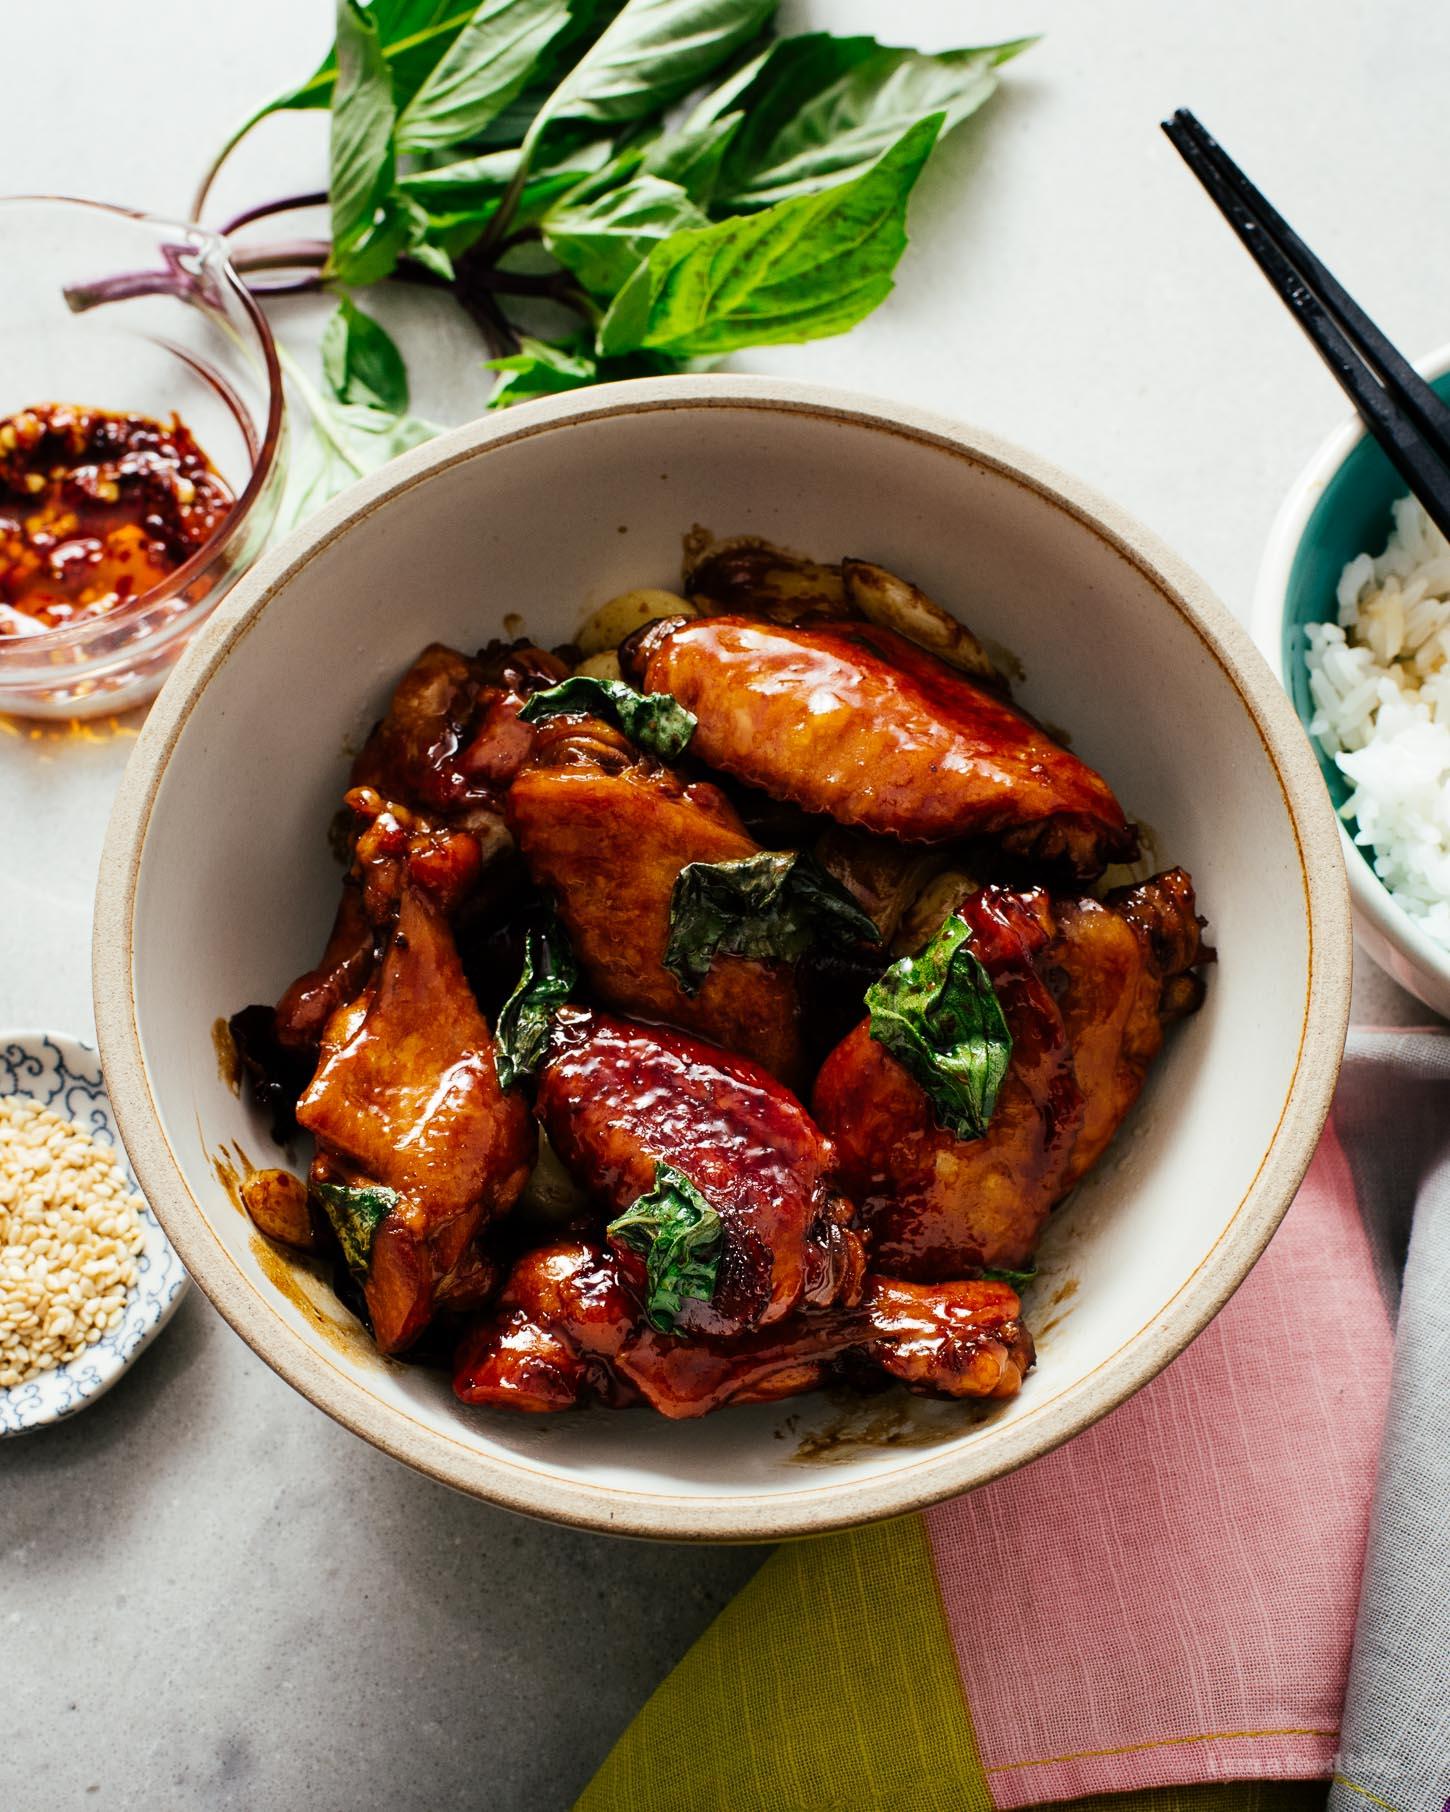 San Bei Ji: 15 Minute Easy Taiwanese 3 Cup Chicken Recipe | www.iamafoodblog.com